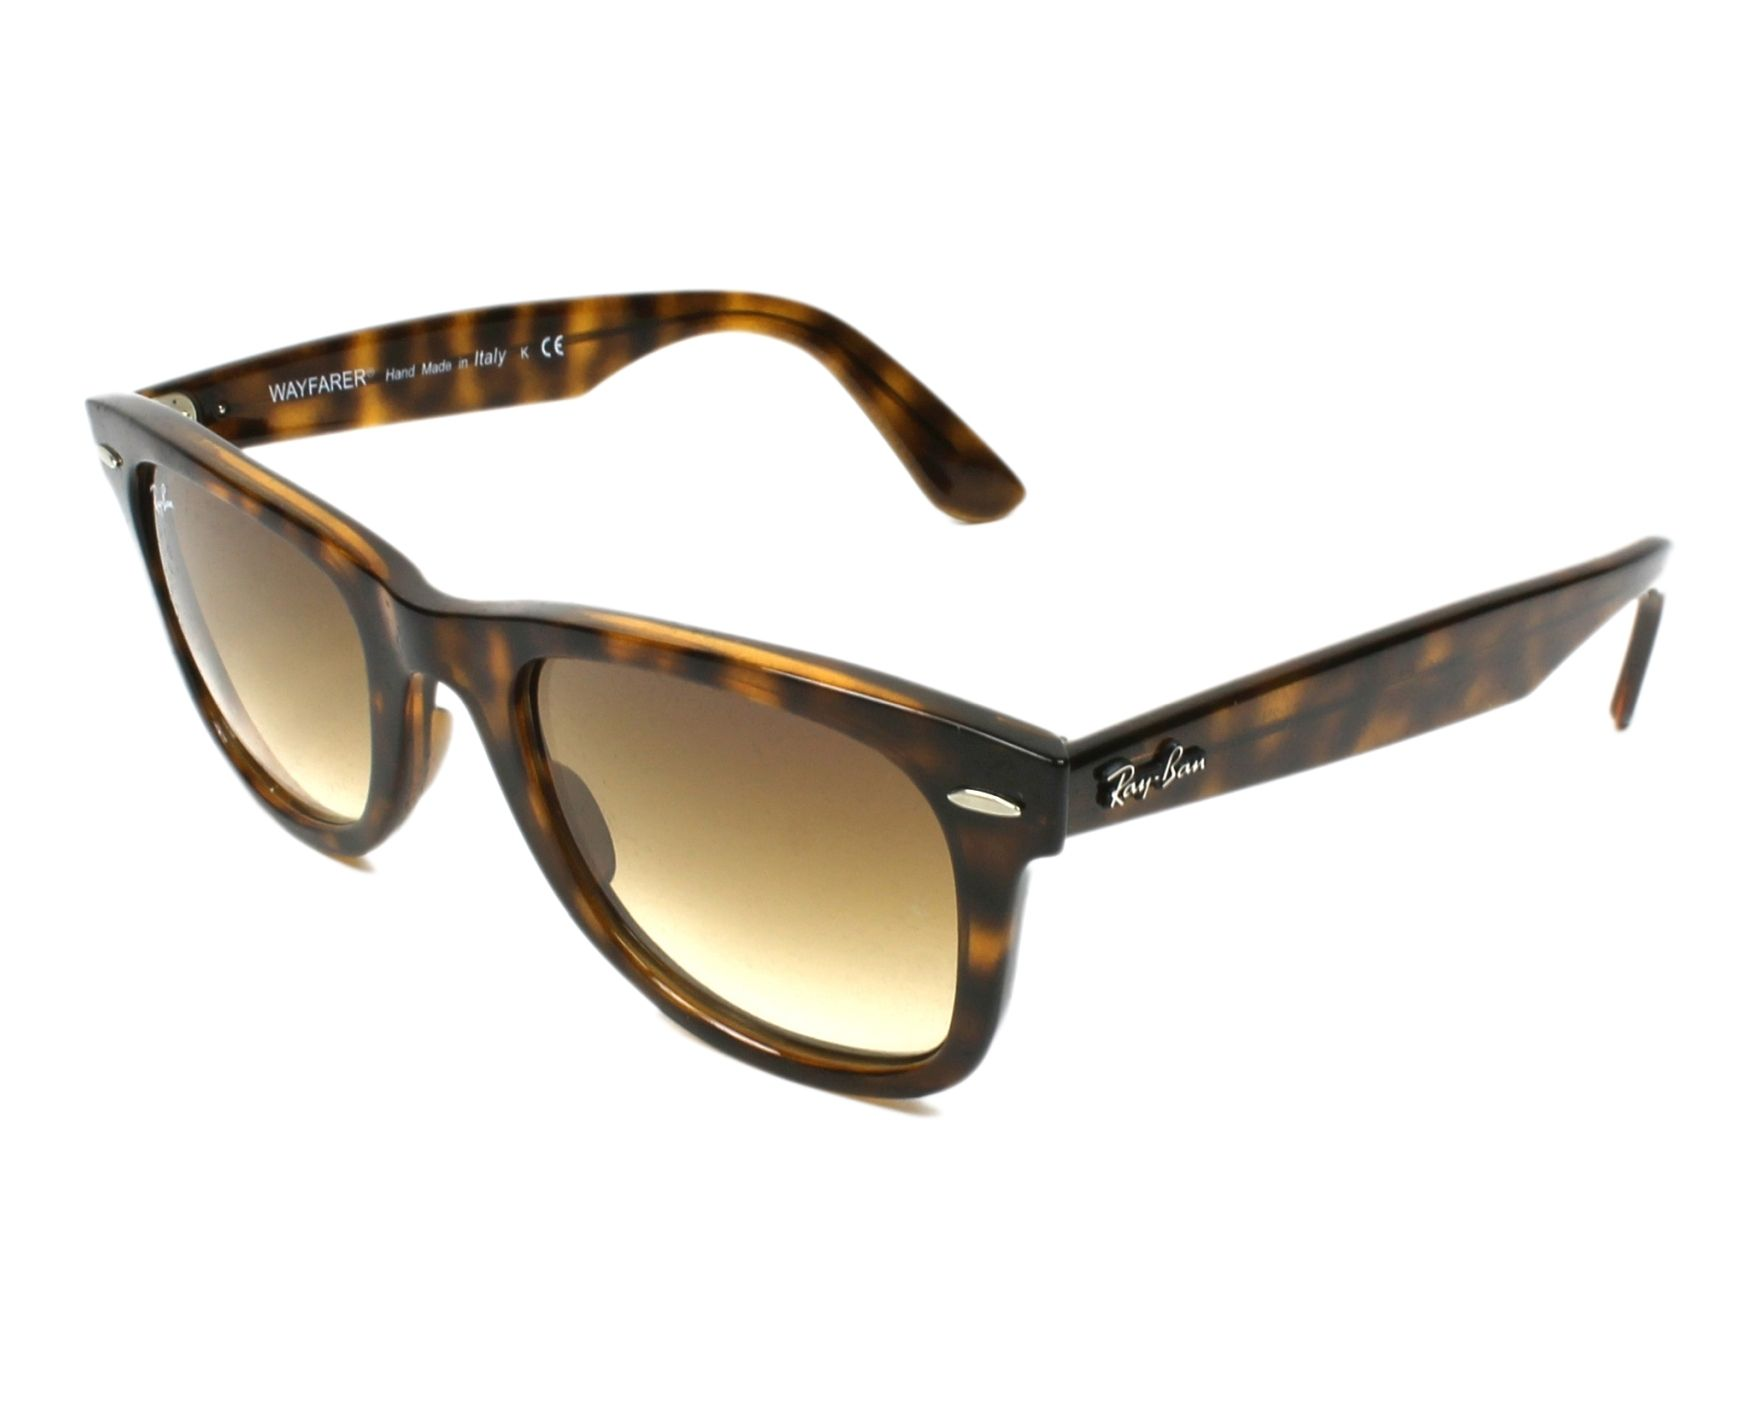 c660638ddb Sunglasses Ray-Ban RB-4340 710 51 50-22 Havana profile view